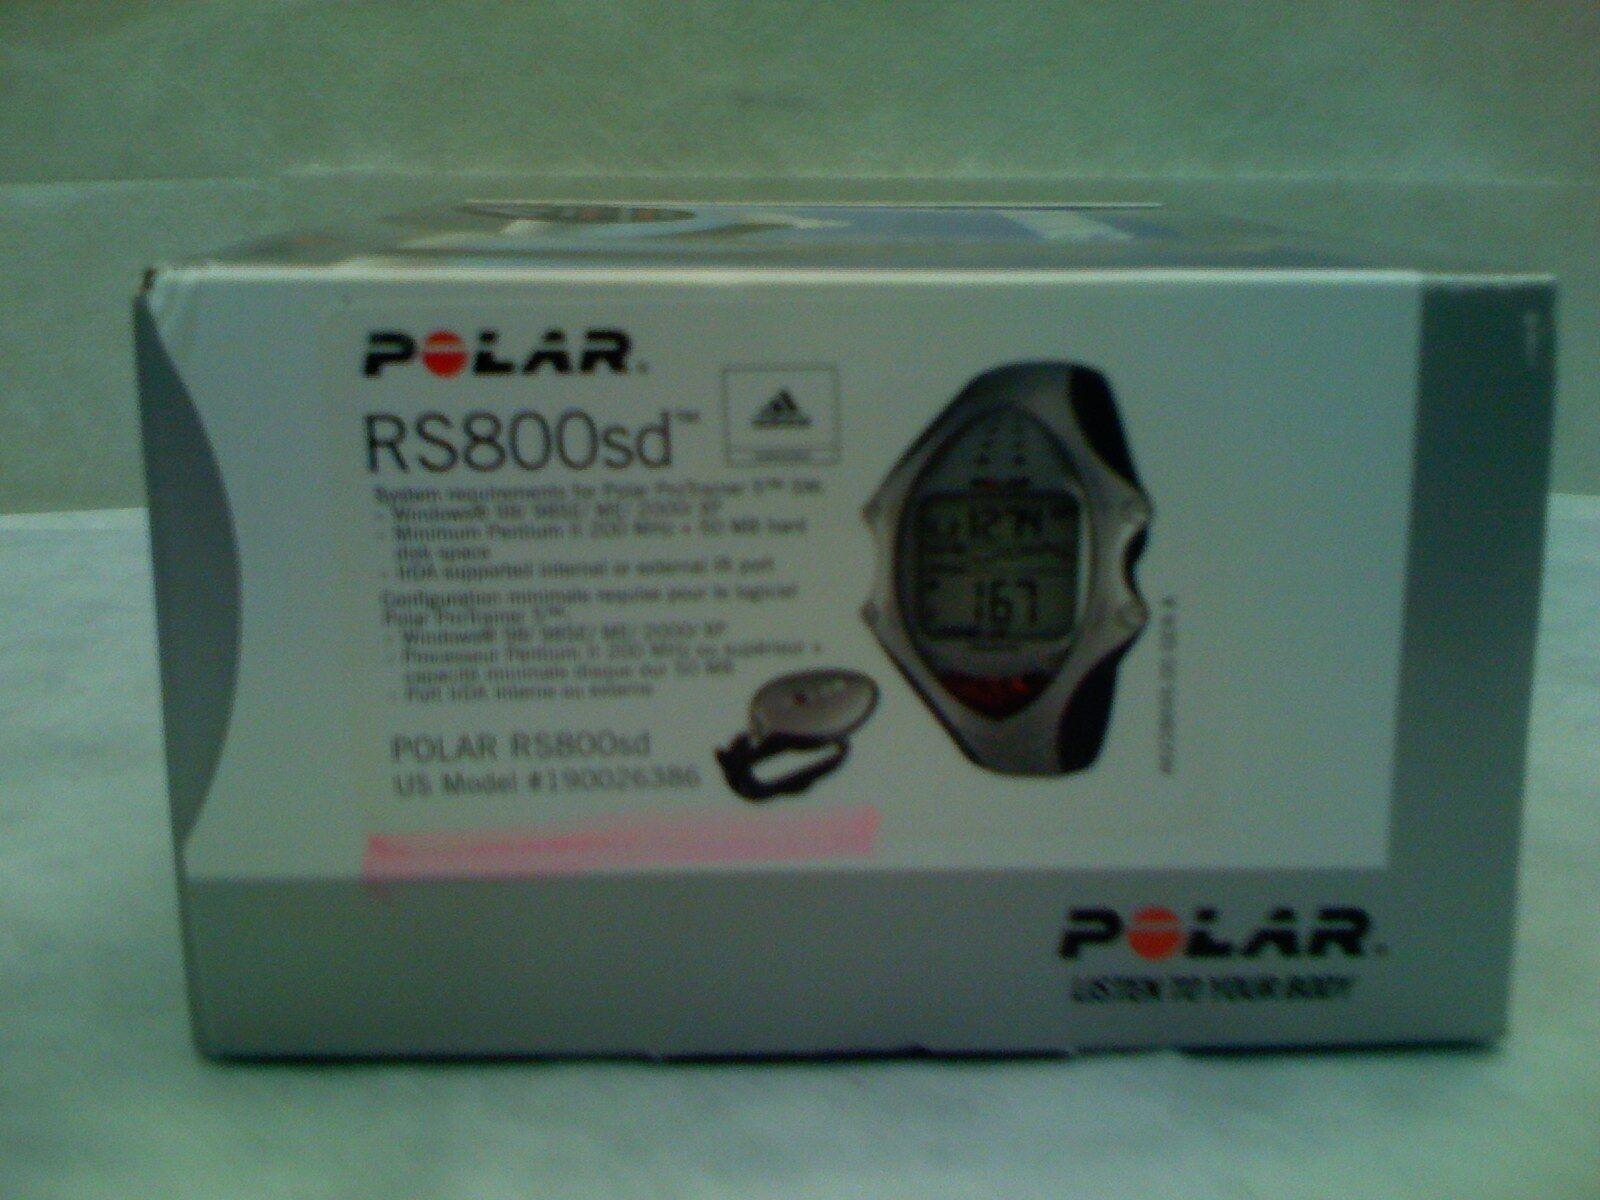 POLAR RS800Sd RUNNING HEART RATE MONITOR BIKE RUN FITNESS FREE HAT 25882 26386